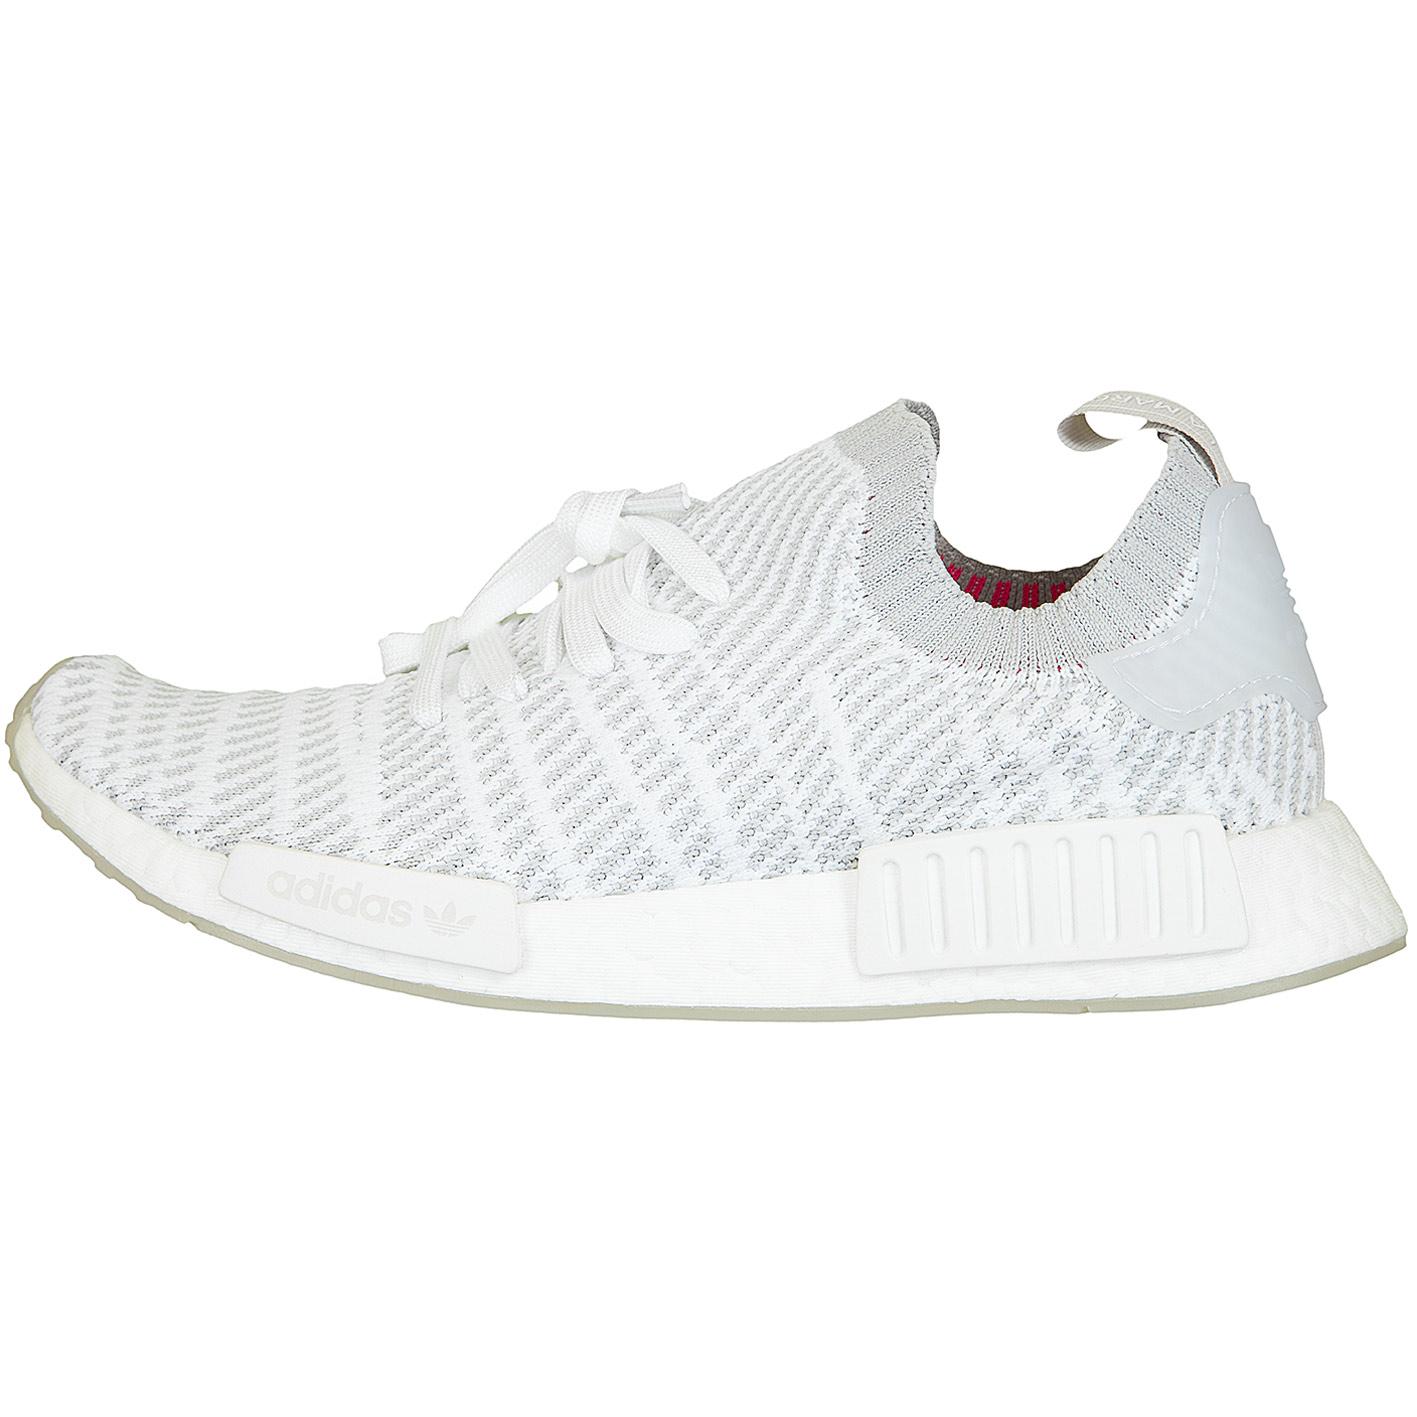 Adidas Originals Sneaker Nmd R1 Stlt Primeknit Weiss Grau Hier